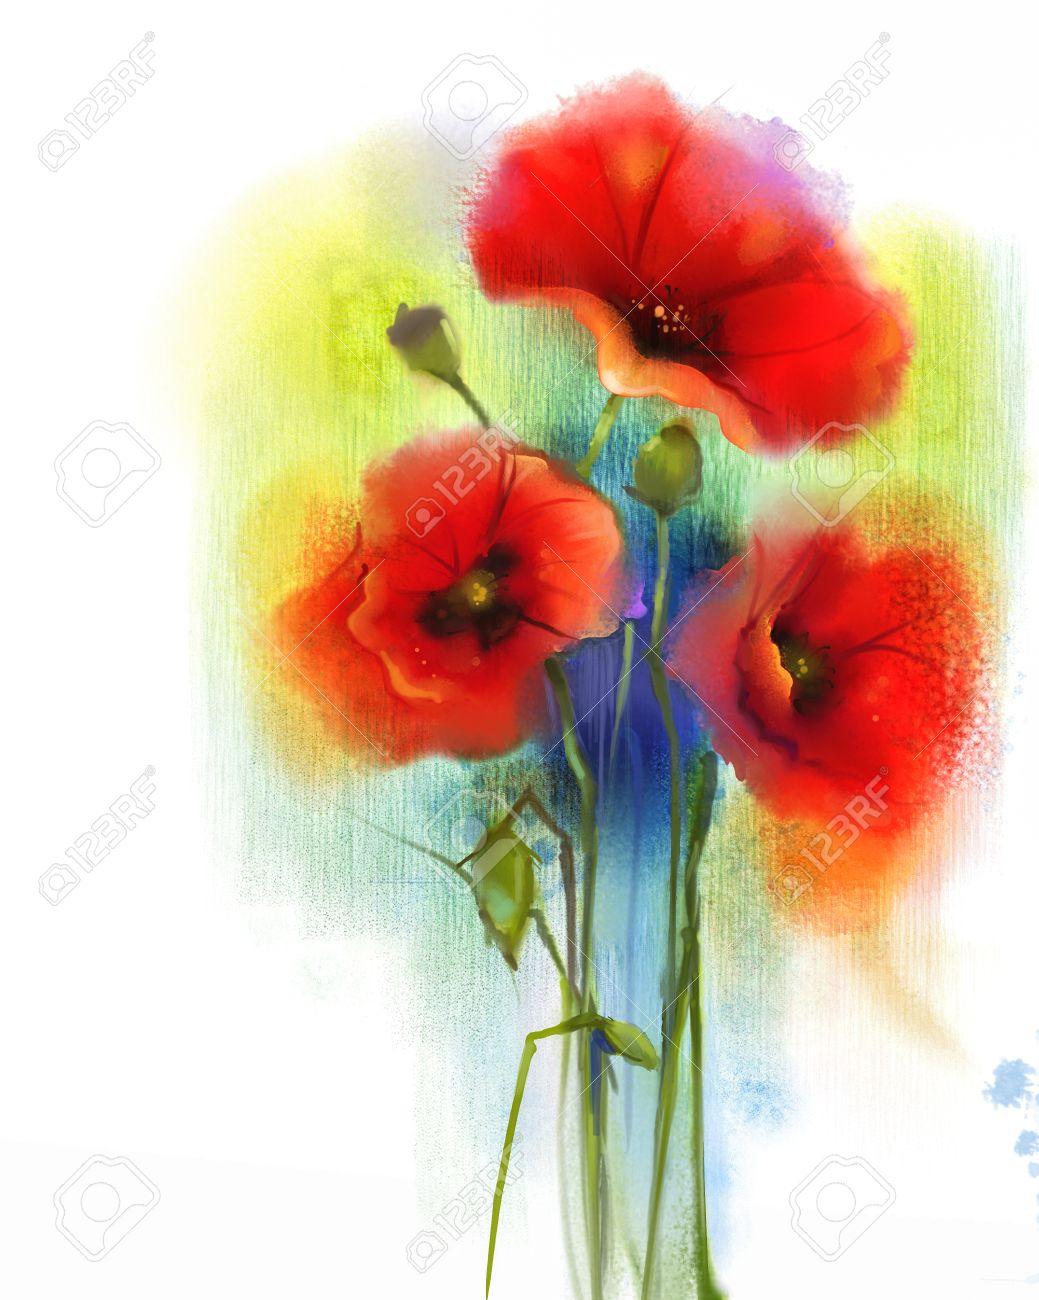 Aquarell Rote Mohnblumenmalerei Hand Malen Mohn Blumen In Sanften